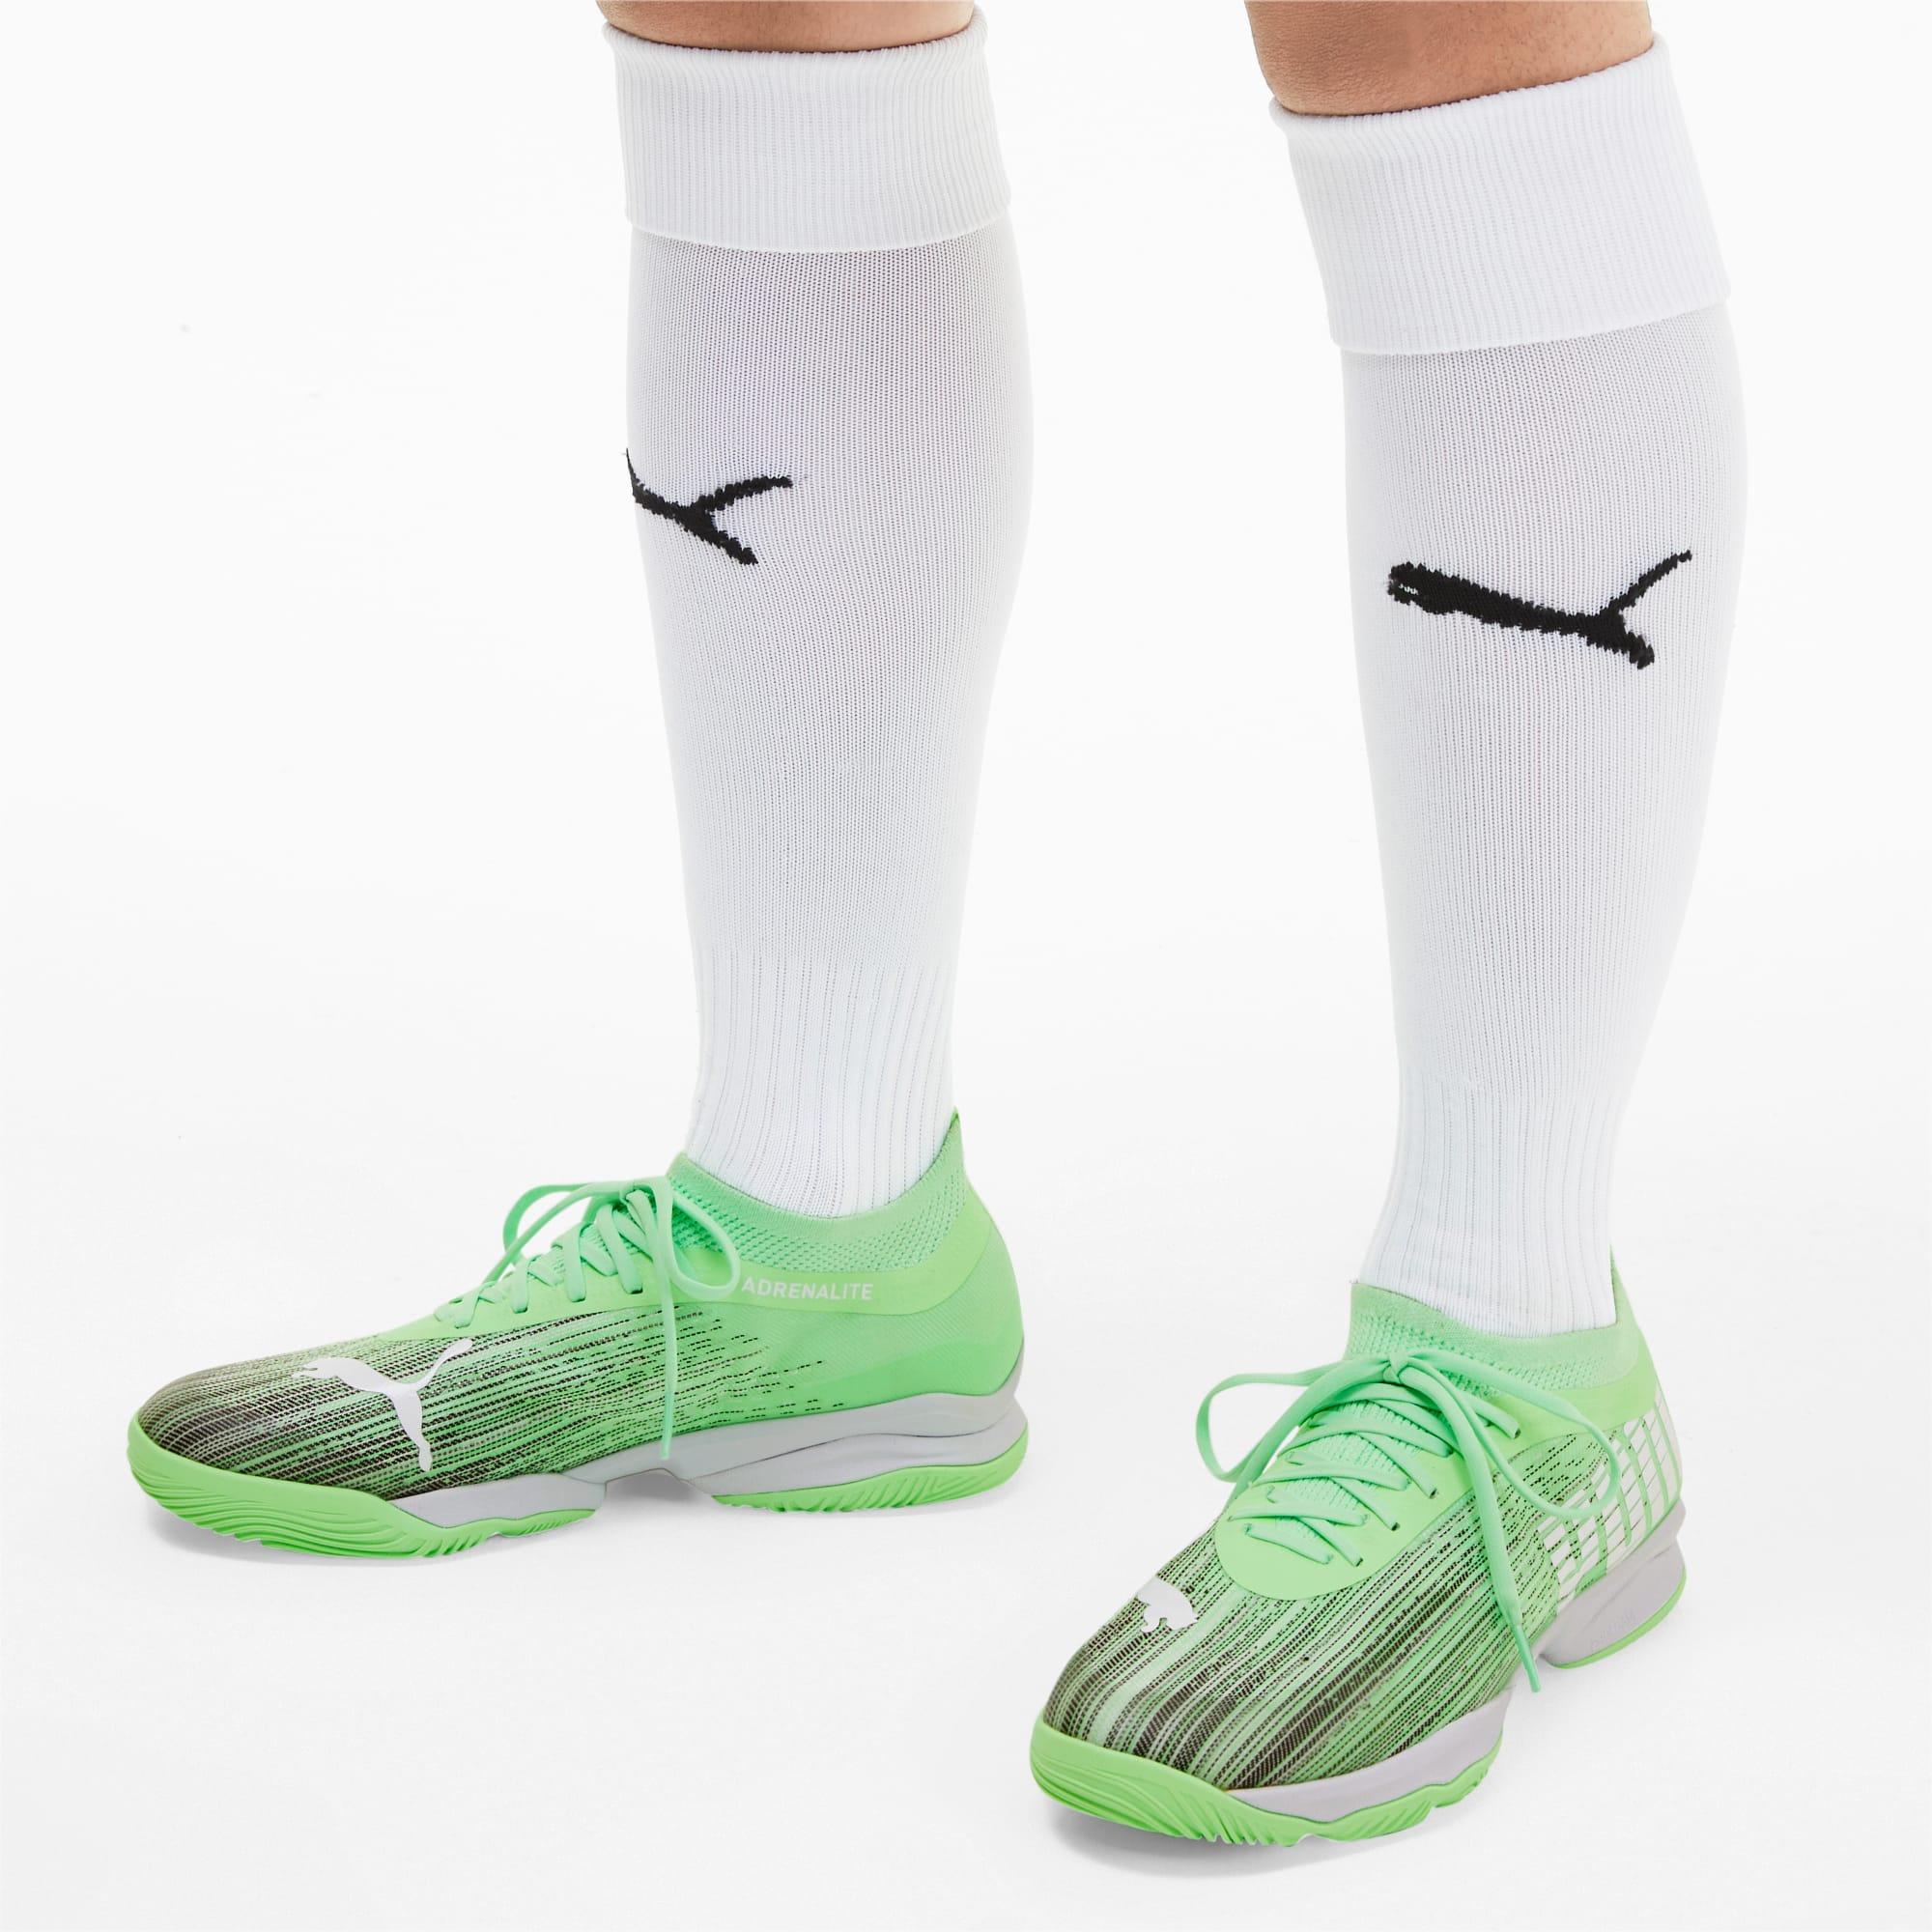 Adrenalite 1.1 Handball ProFoam Shoes